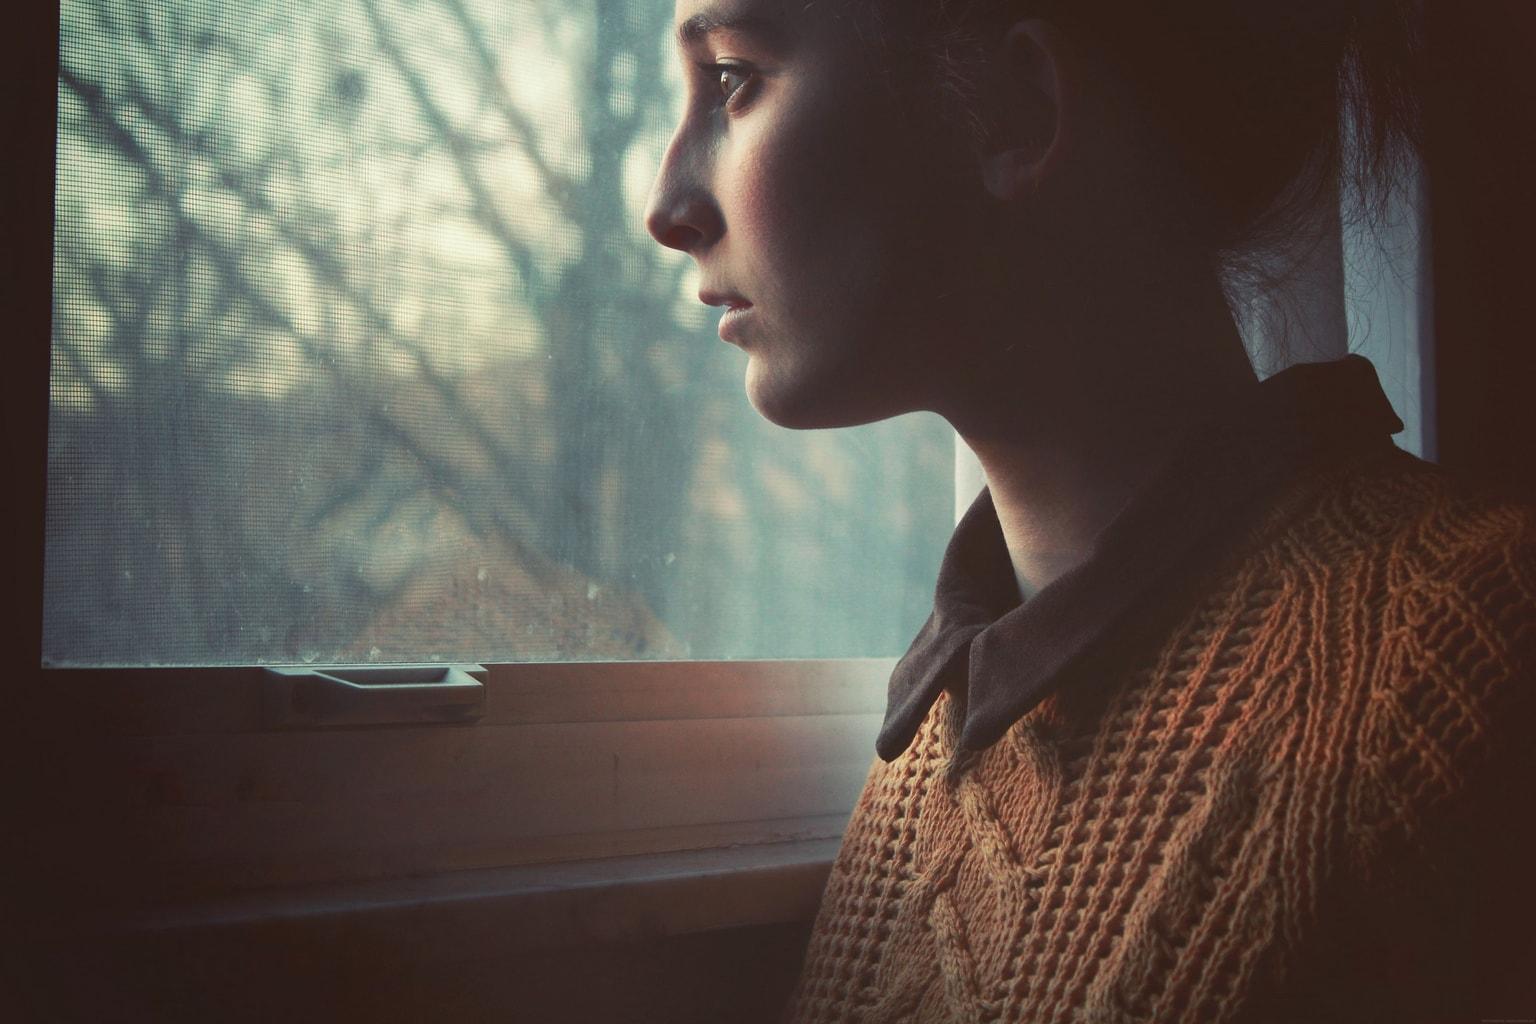 Retrato junto a una ventana